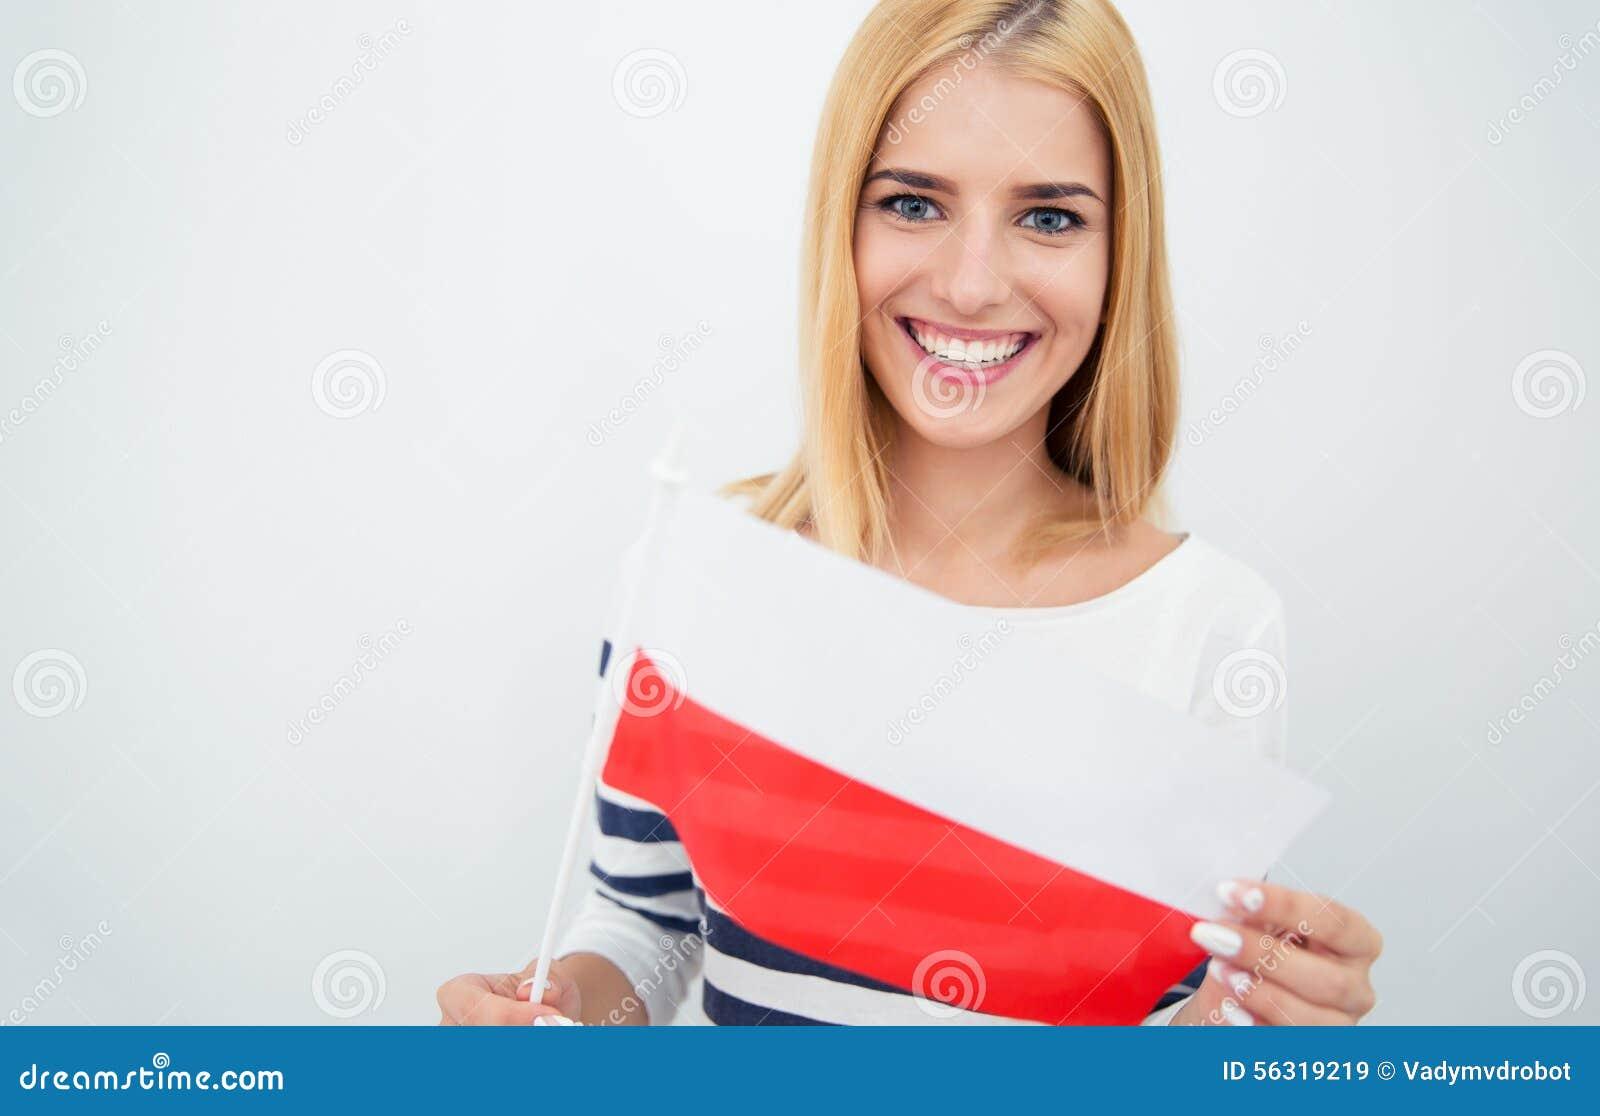 Polish cam girls